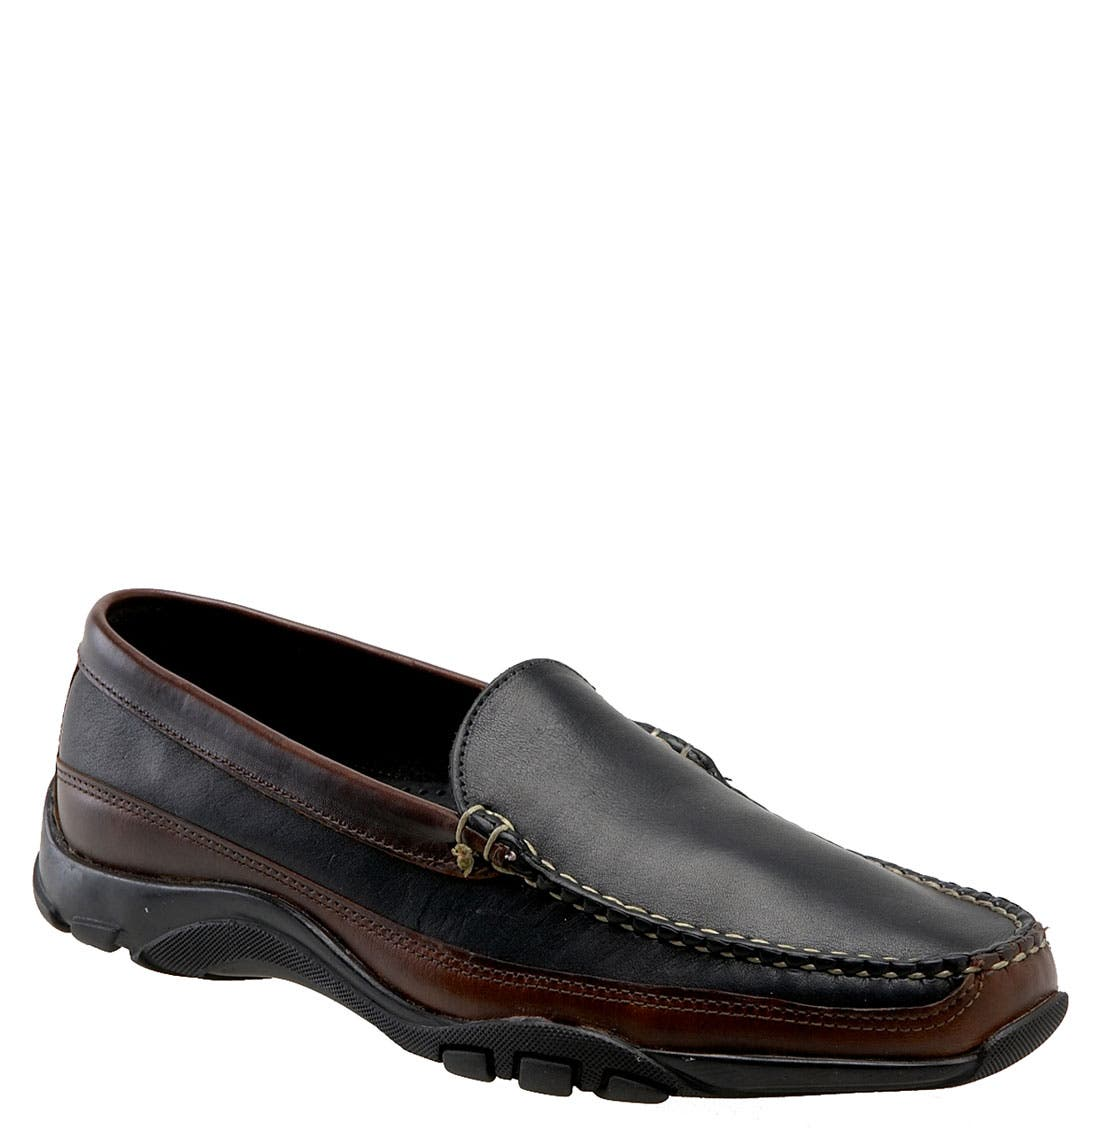 ALLEN EDMONDS,                             'Boulder' Driving Loafer,                             Main thumbnail 1, color,                             Black/Brown